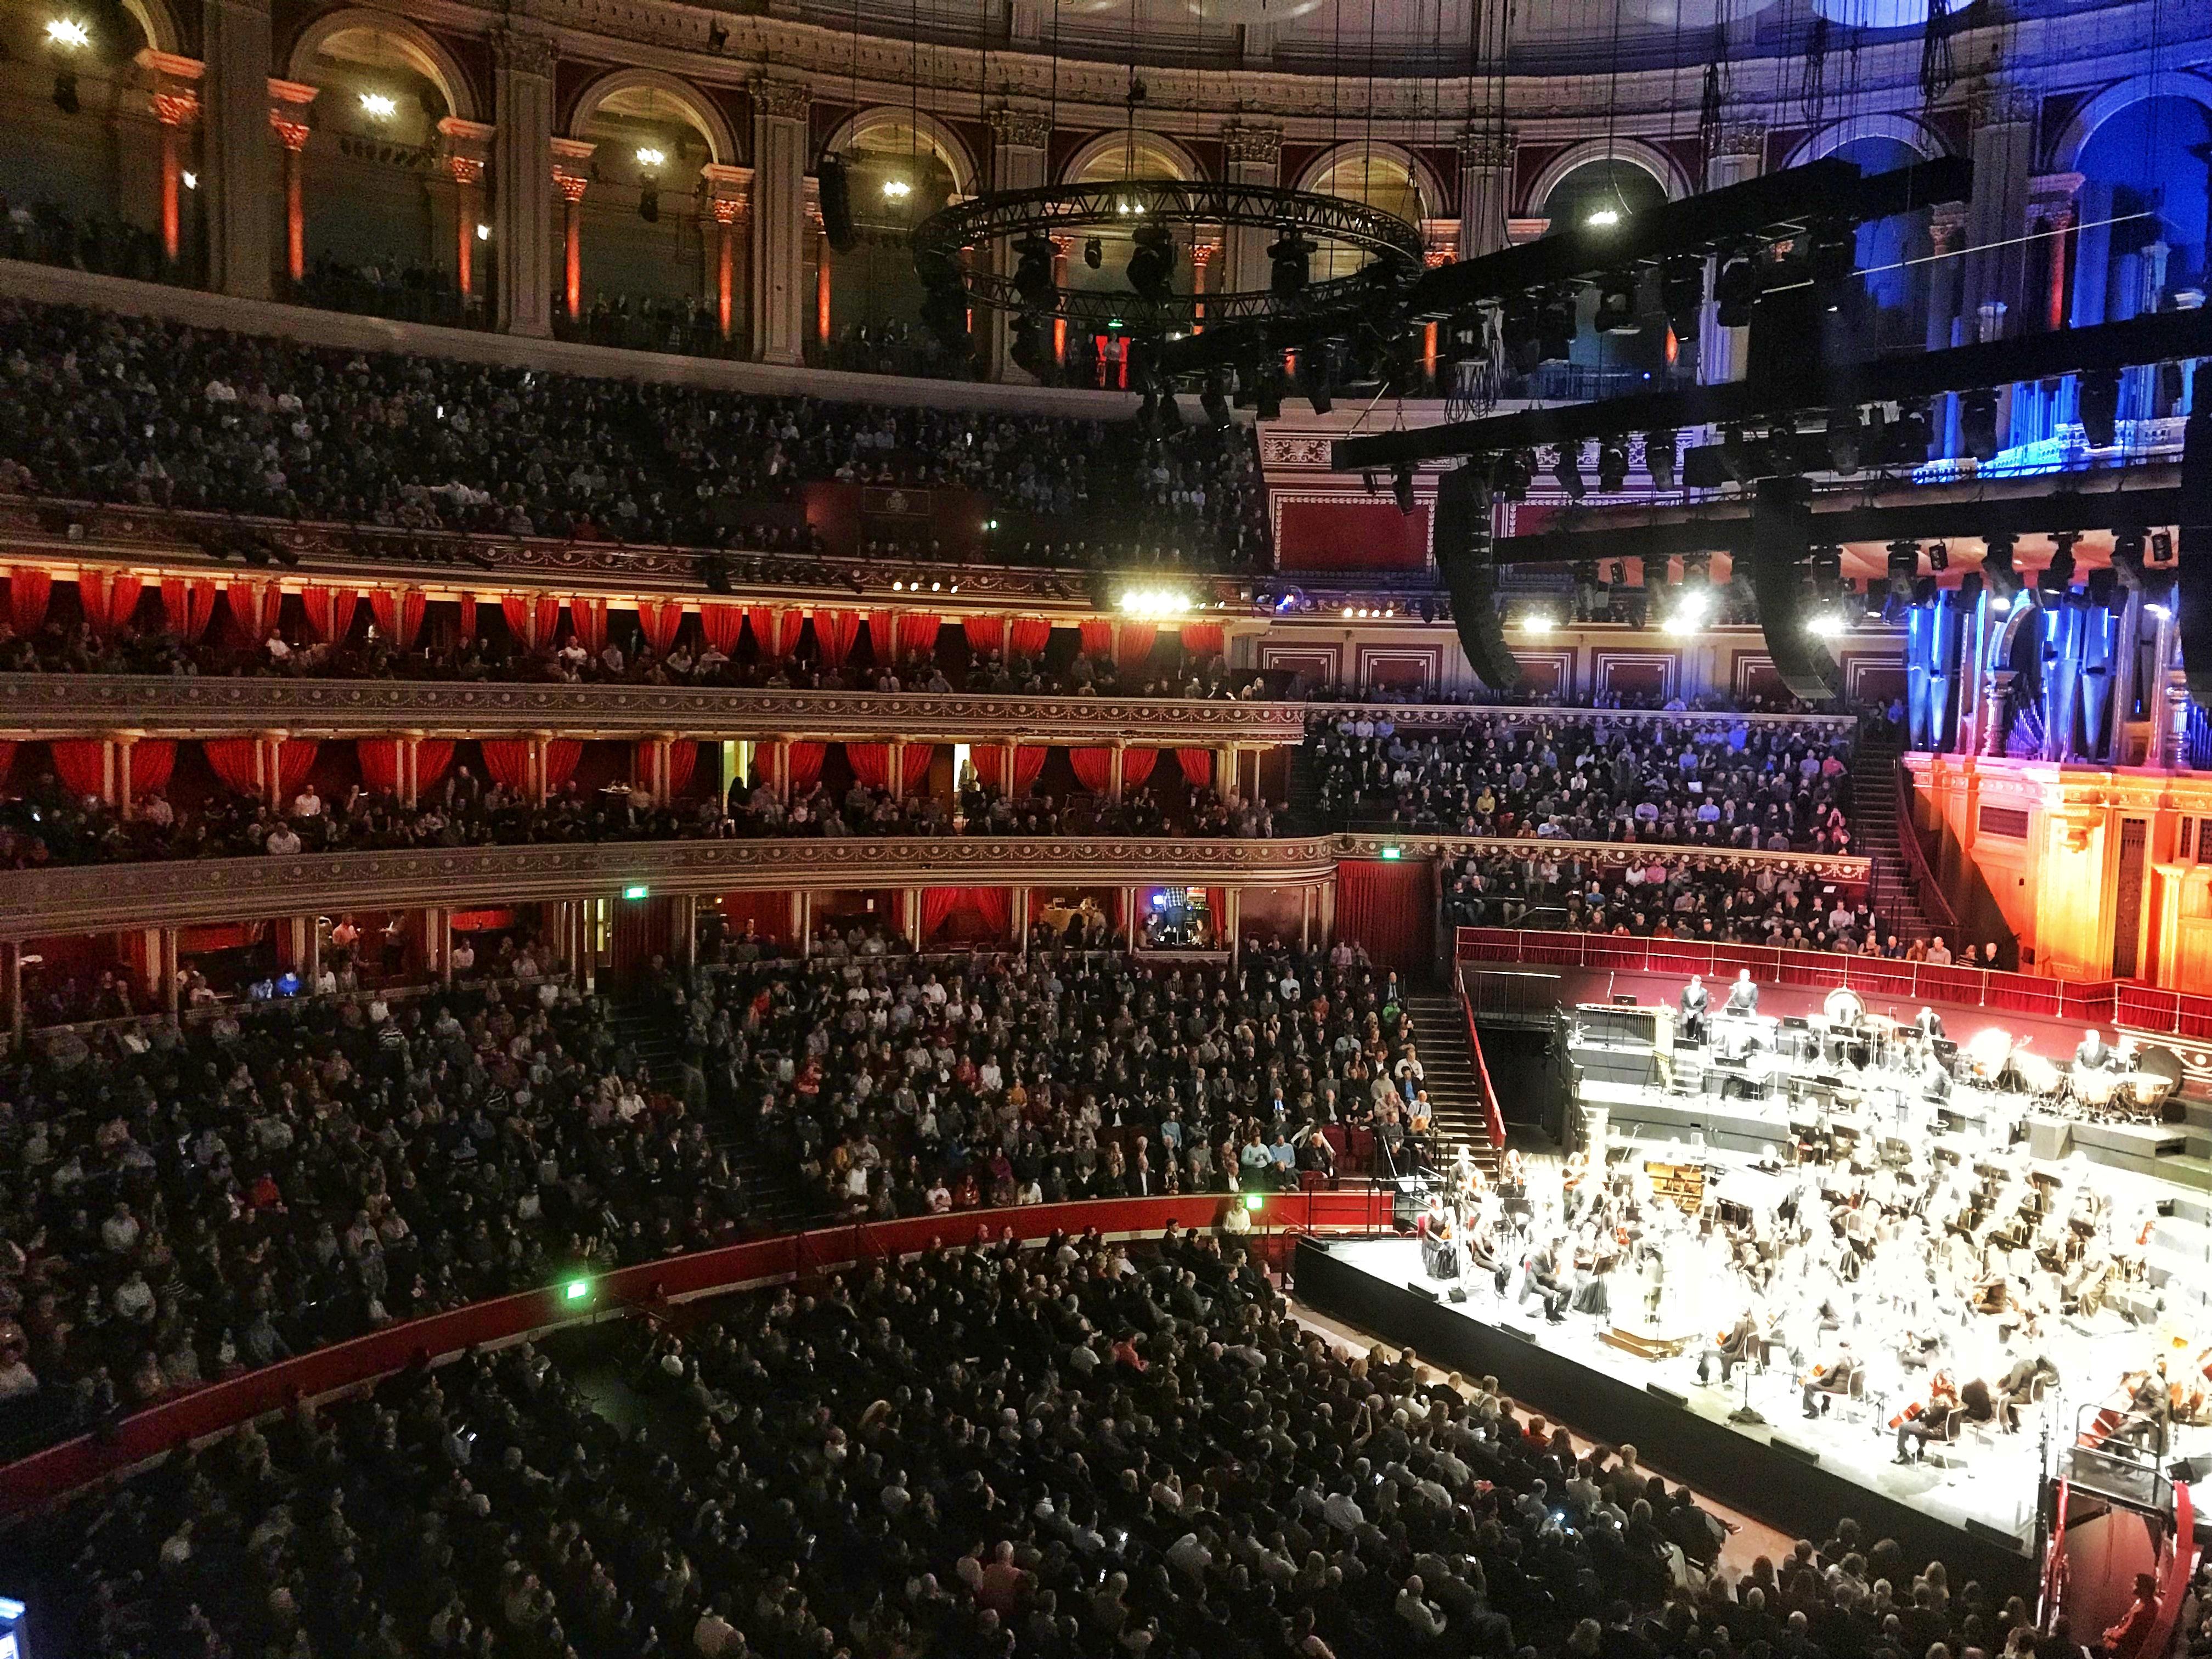 Royal Albert Hall Totale